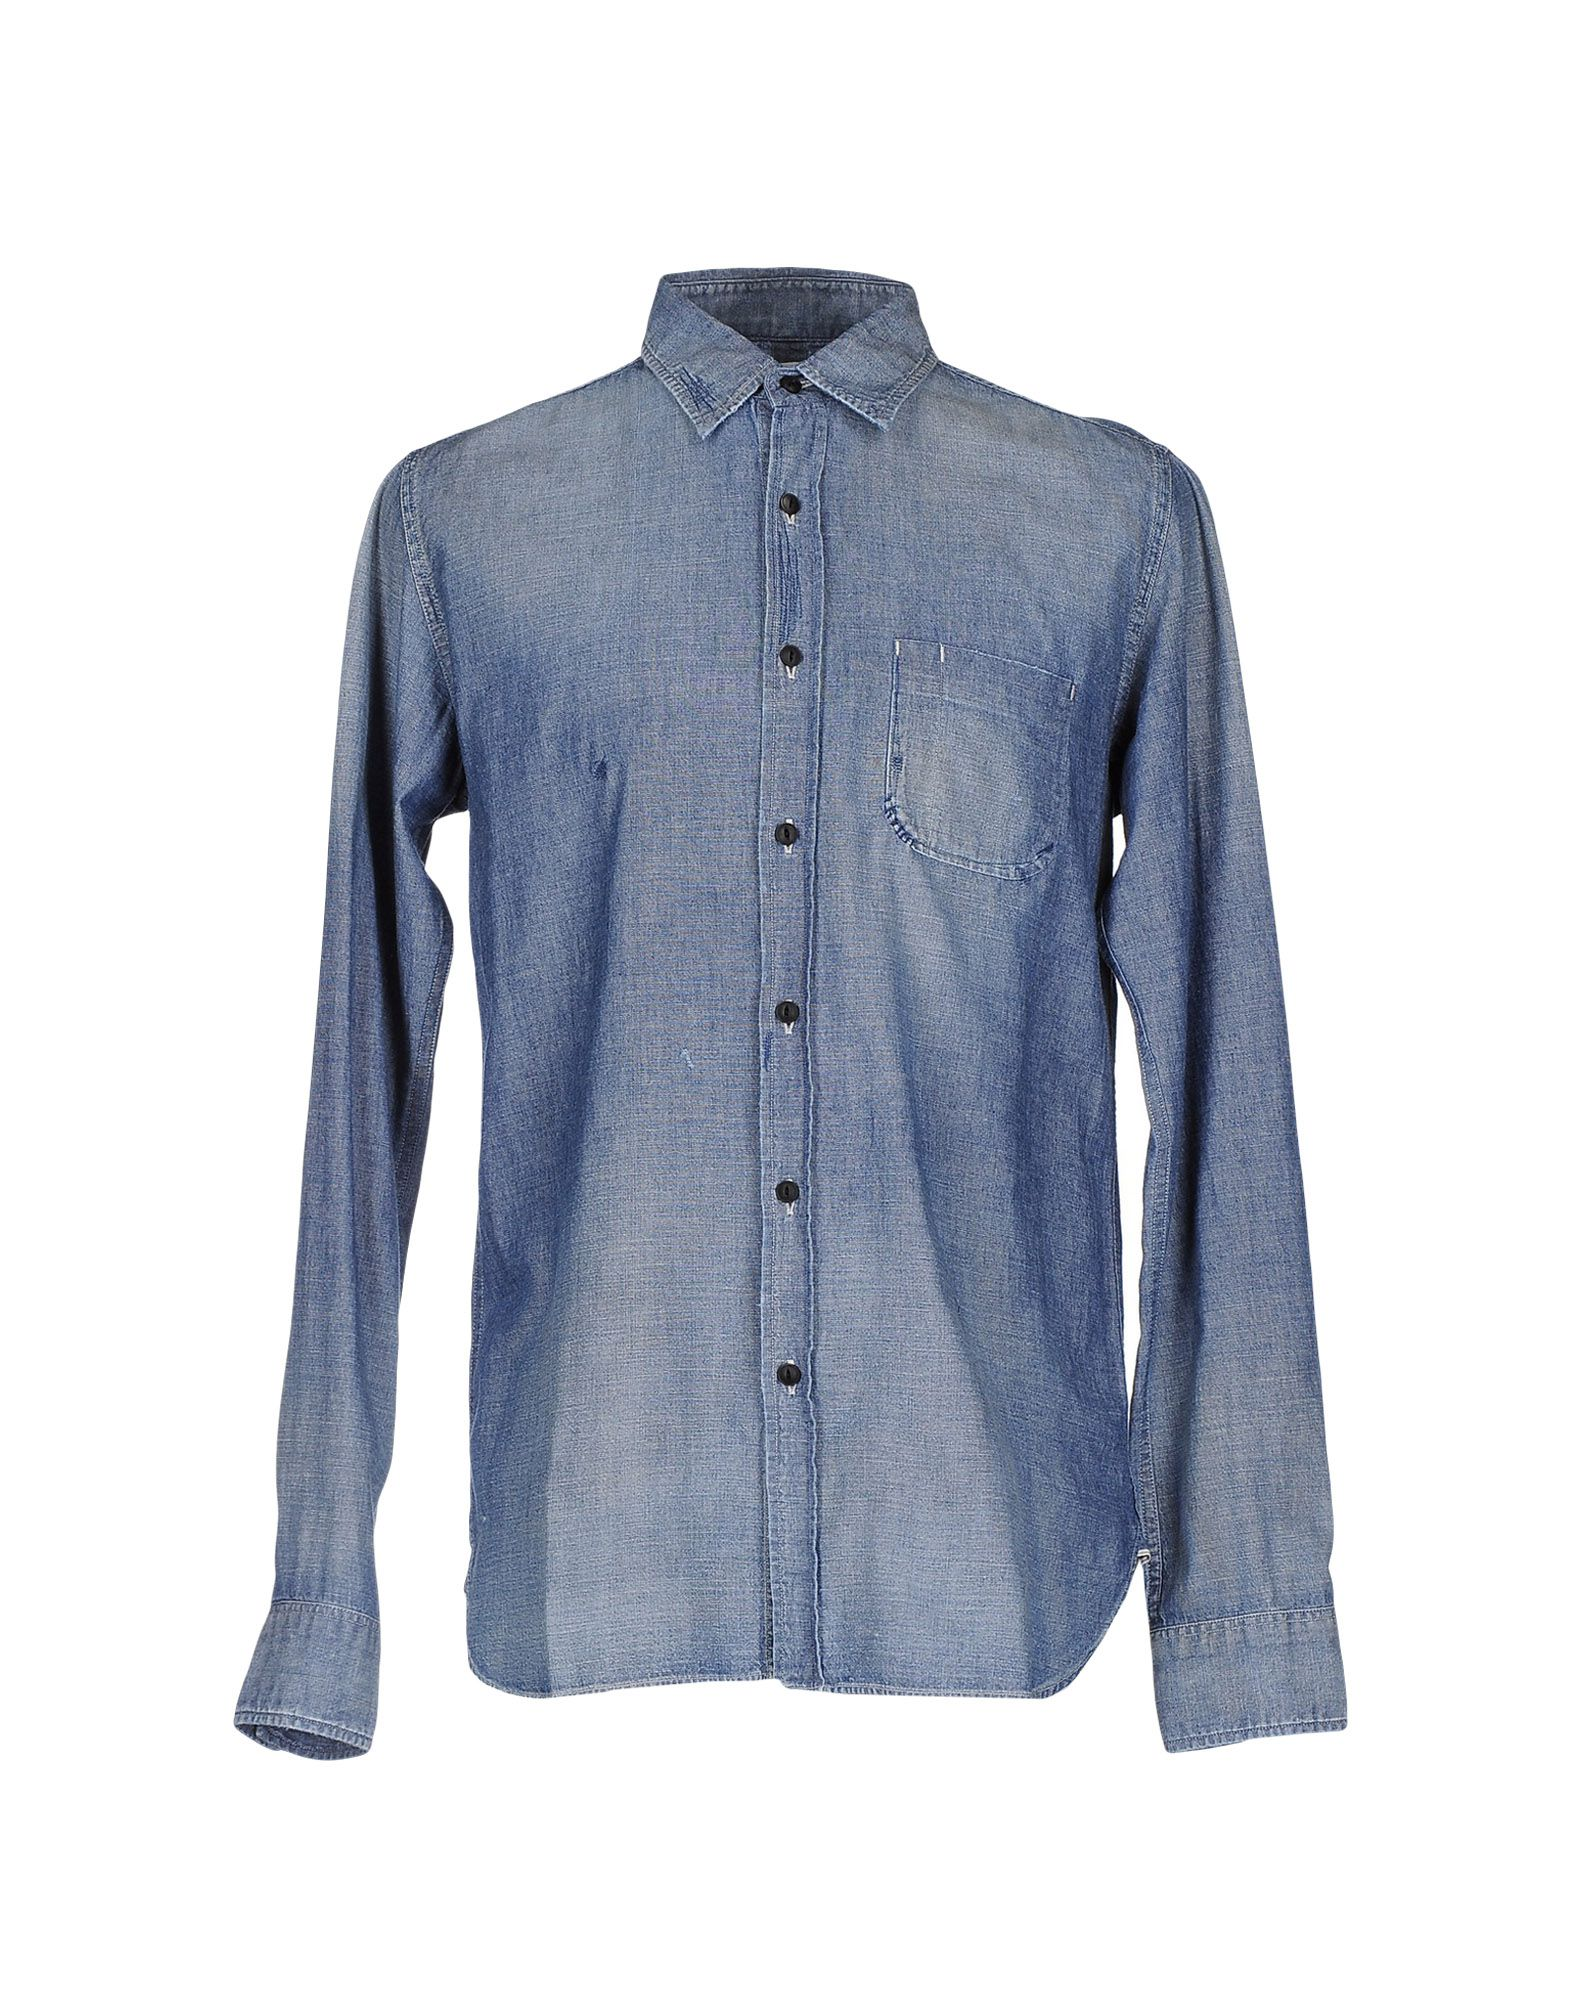 KURO Джинсовая рубашка kuro джинсовая верхняя одежда